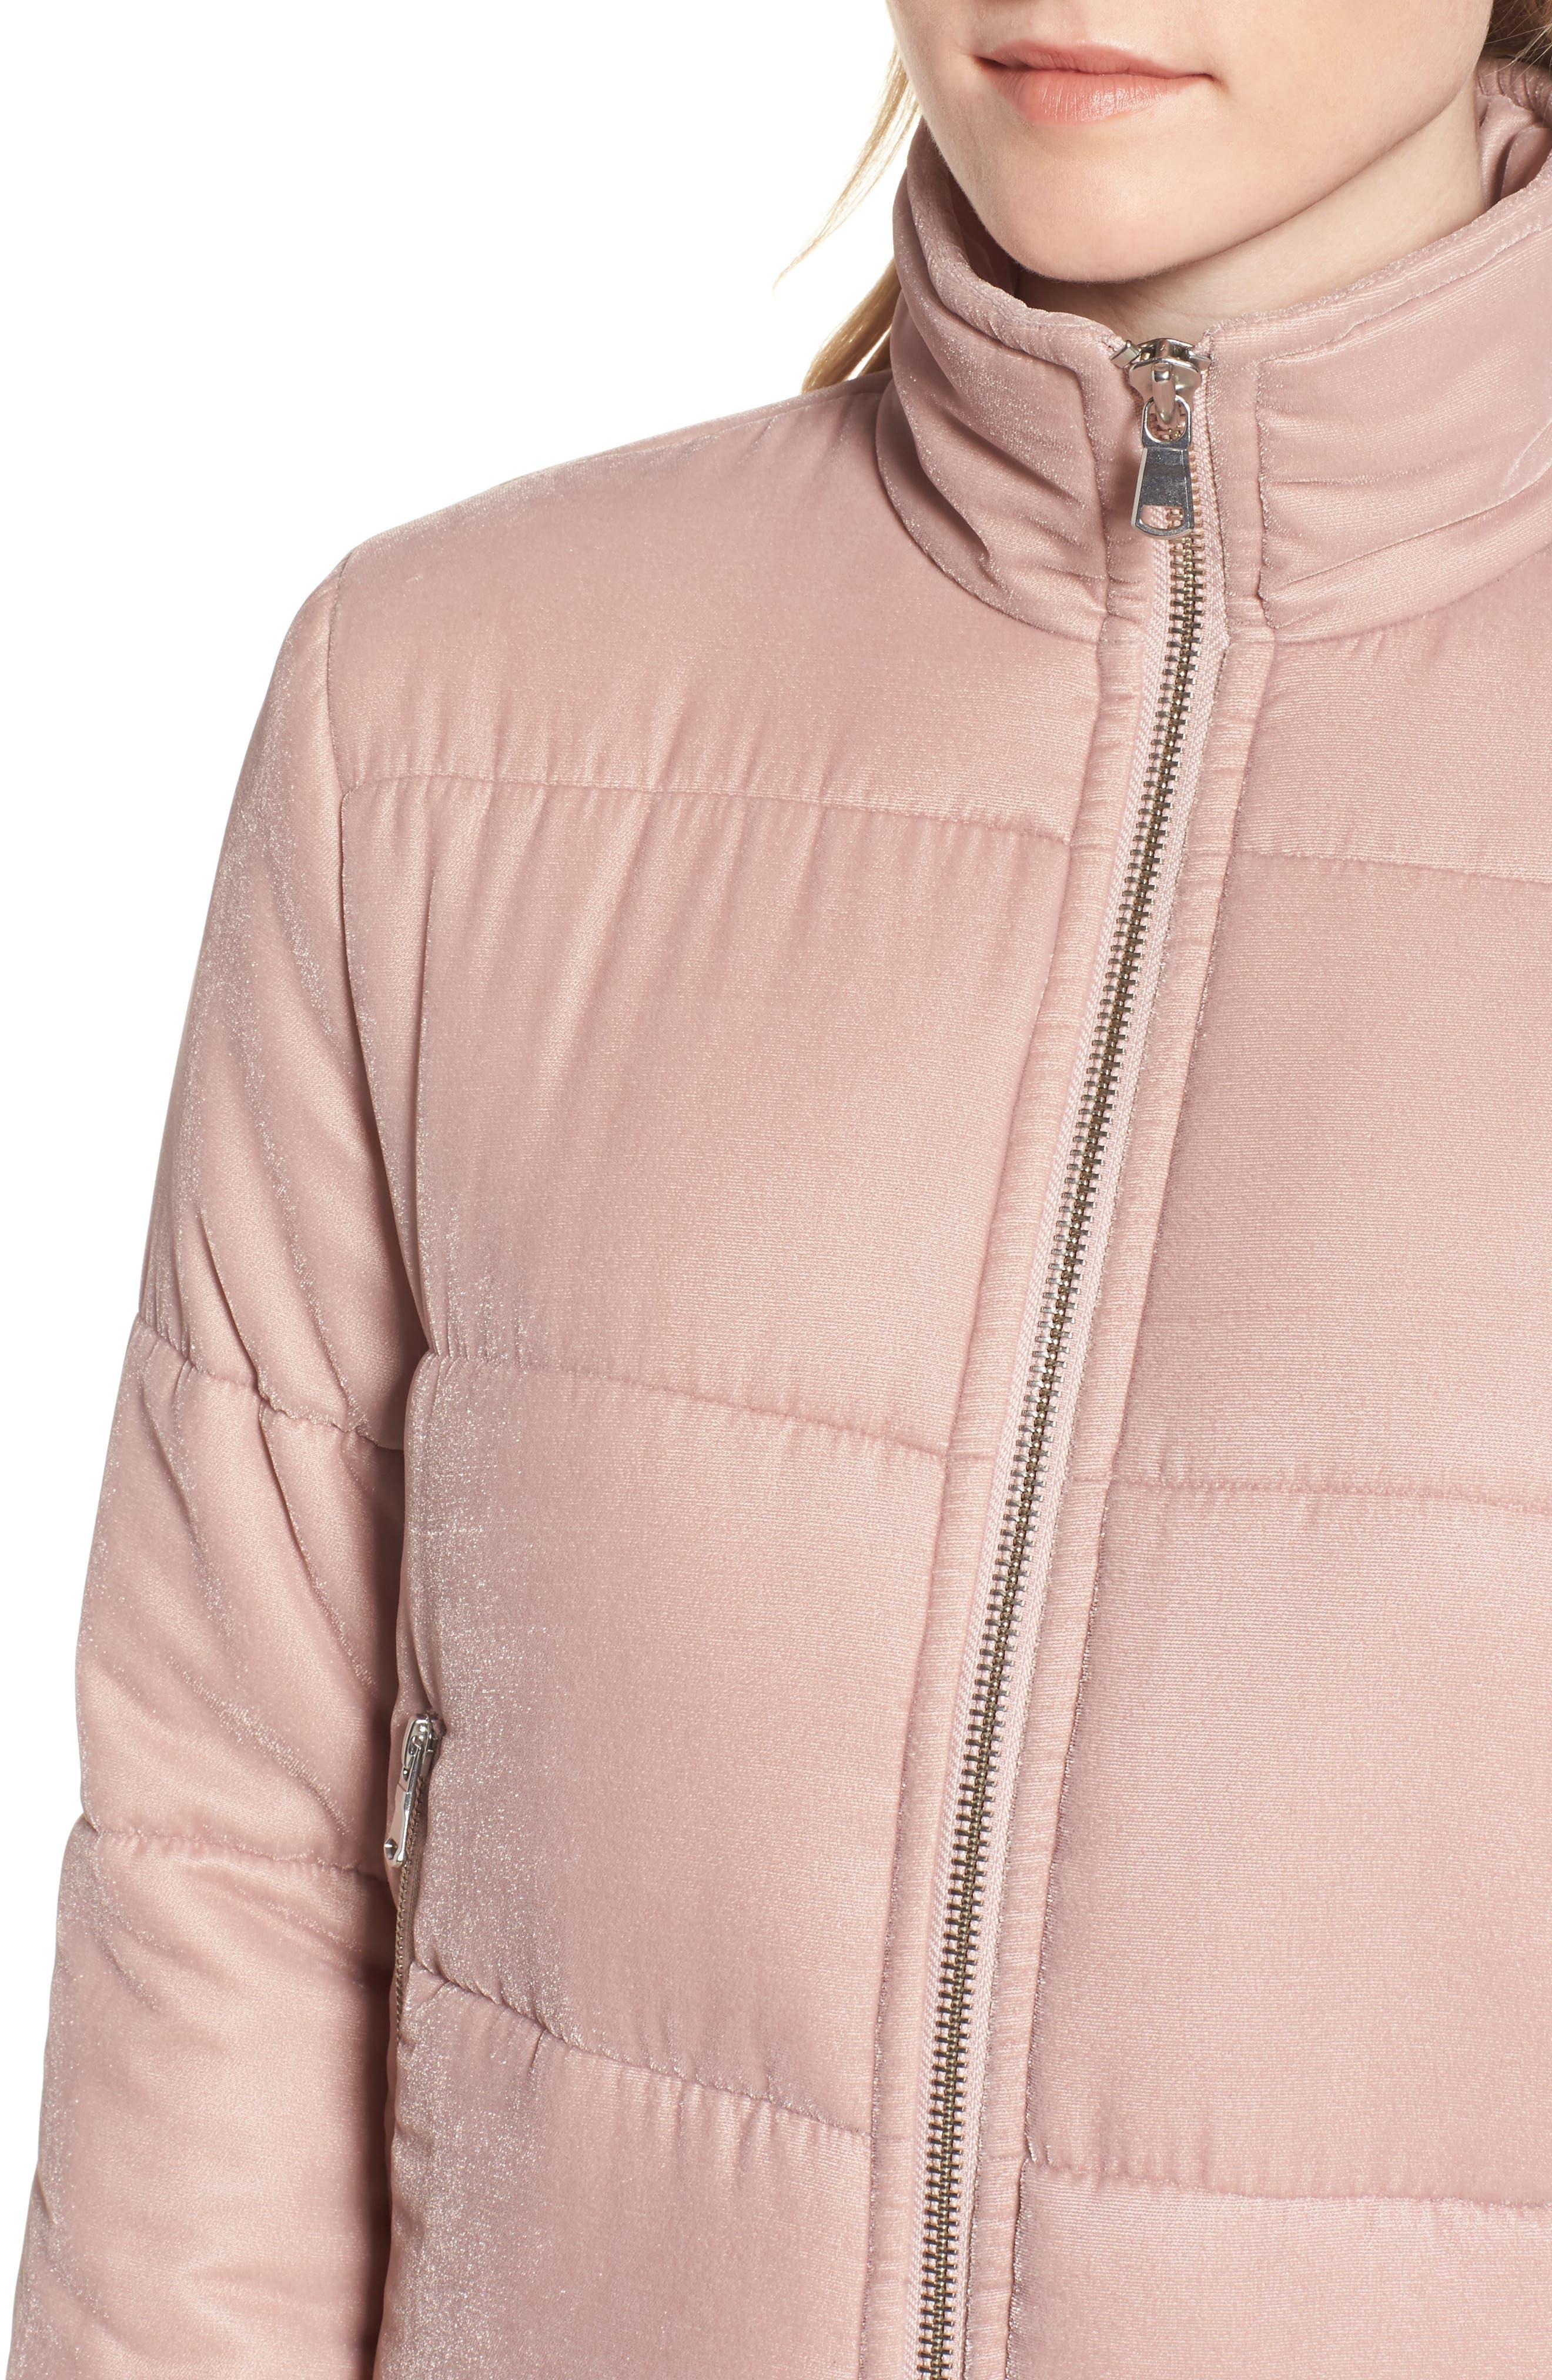 Quilted Velvet Jacket,                             Alternate thumbnail 4, color,                             Pink Adobe